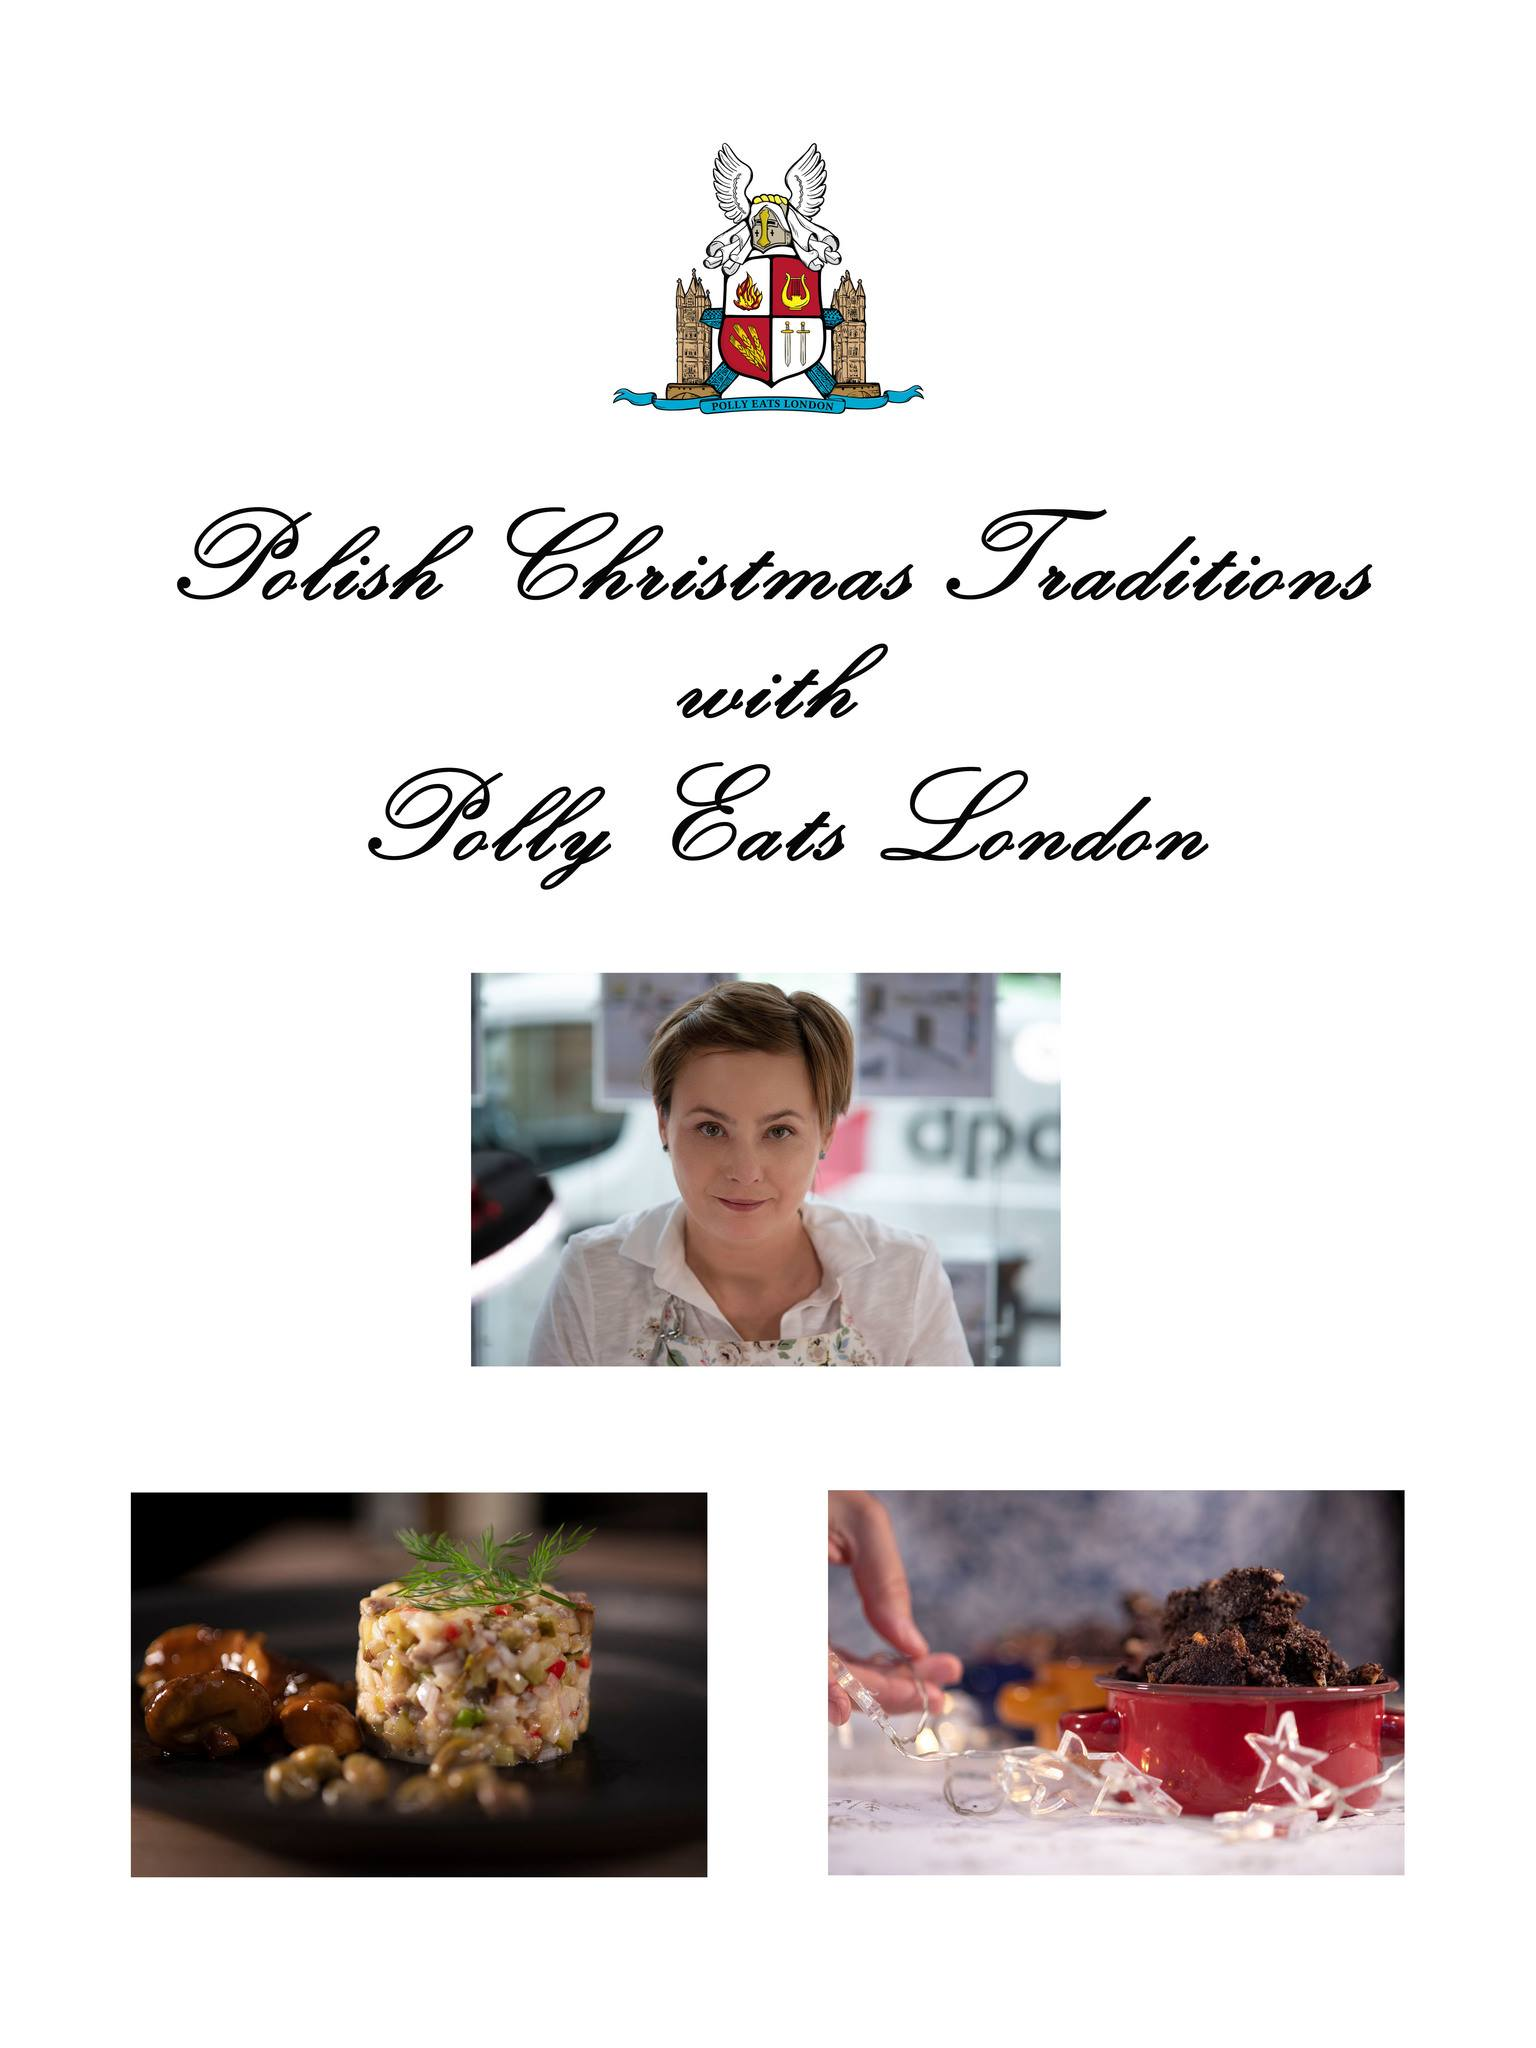 Polish Christmas traditions with Polly Eats London